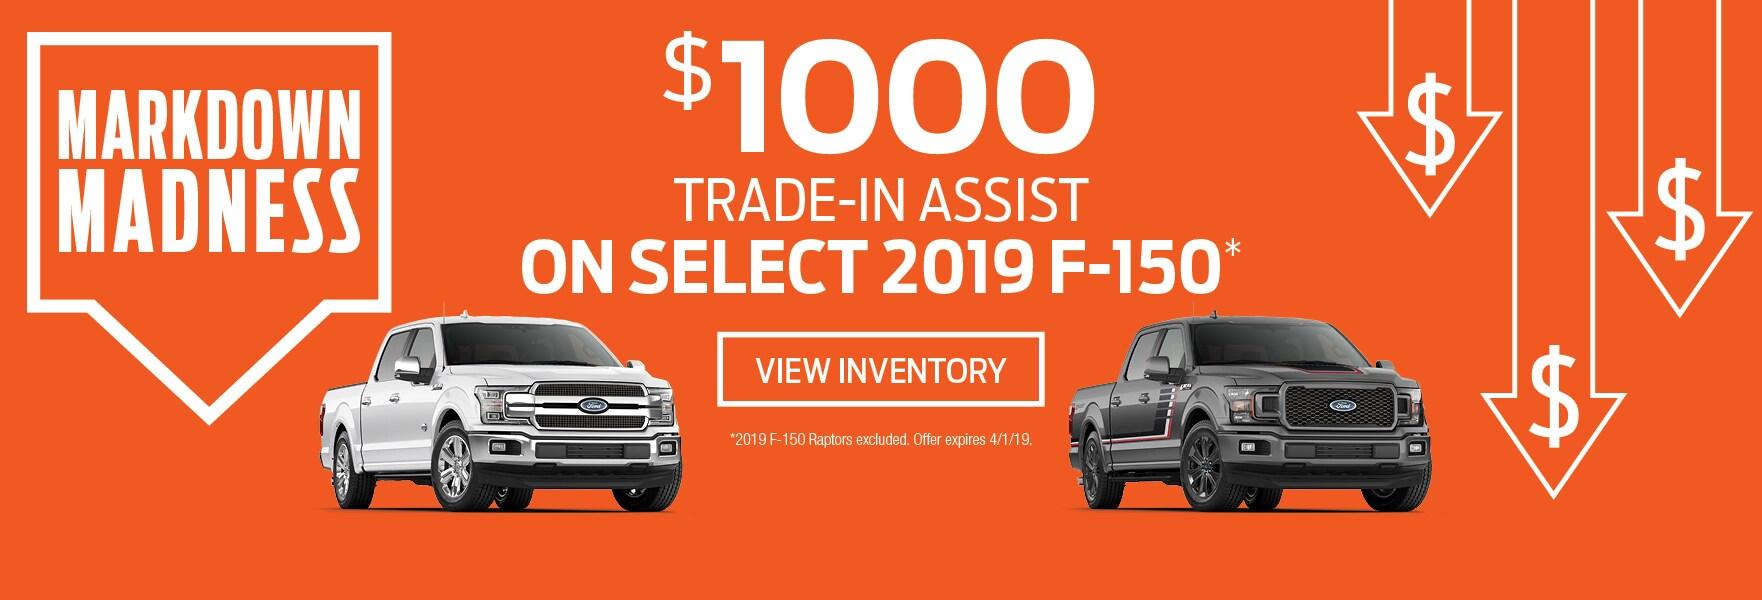 Camelback Ford New Amp Used Cars Trucks Suvs Amp Vans Phoenix Amp Scottsdale Az